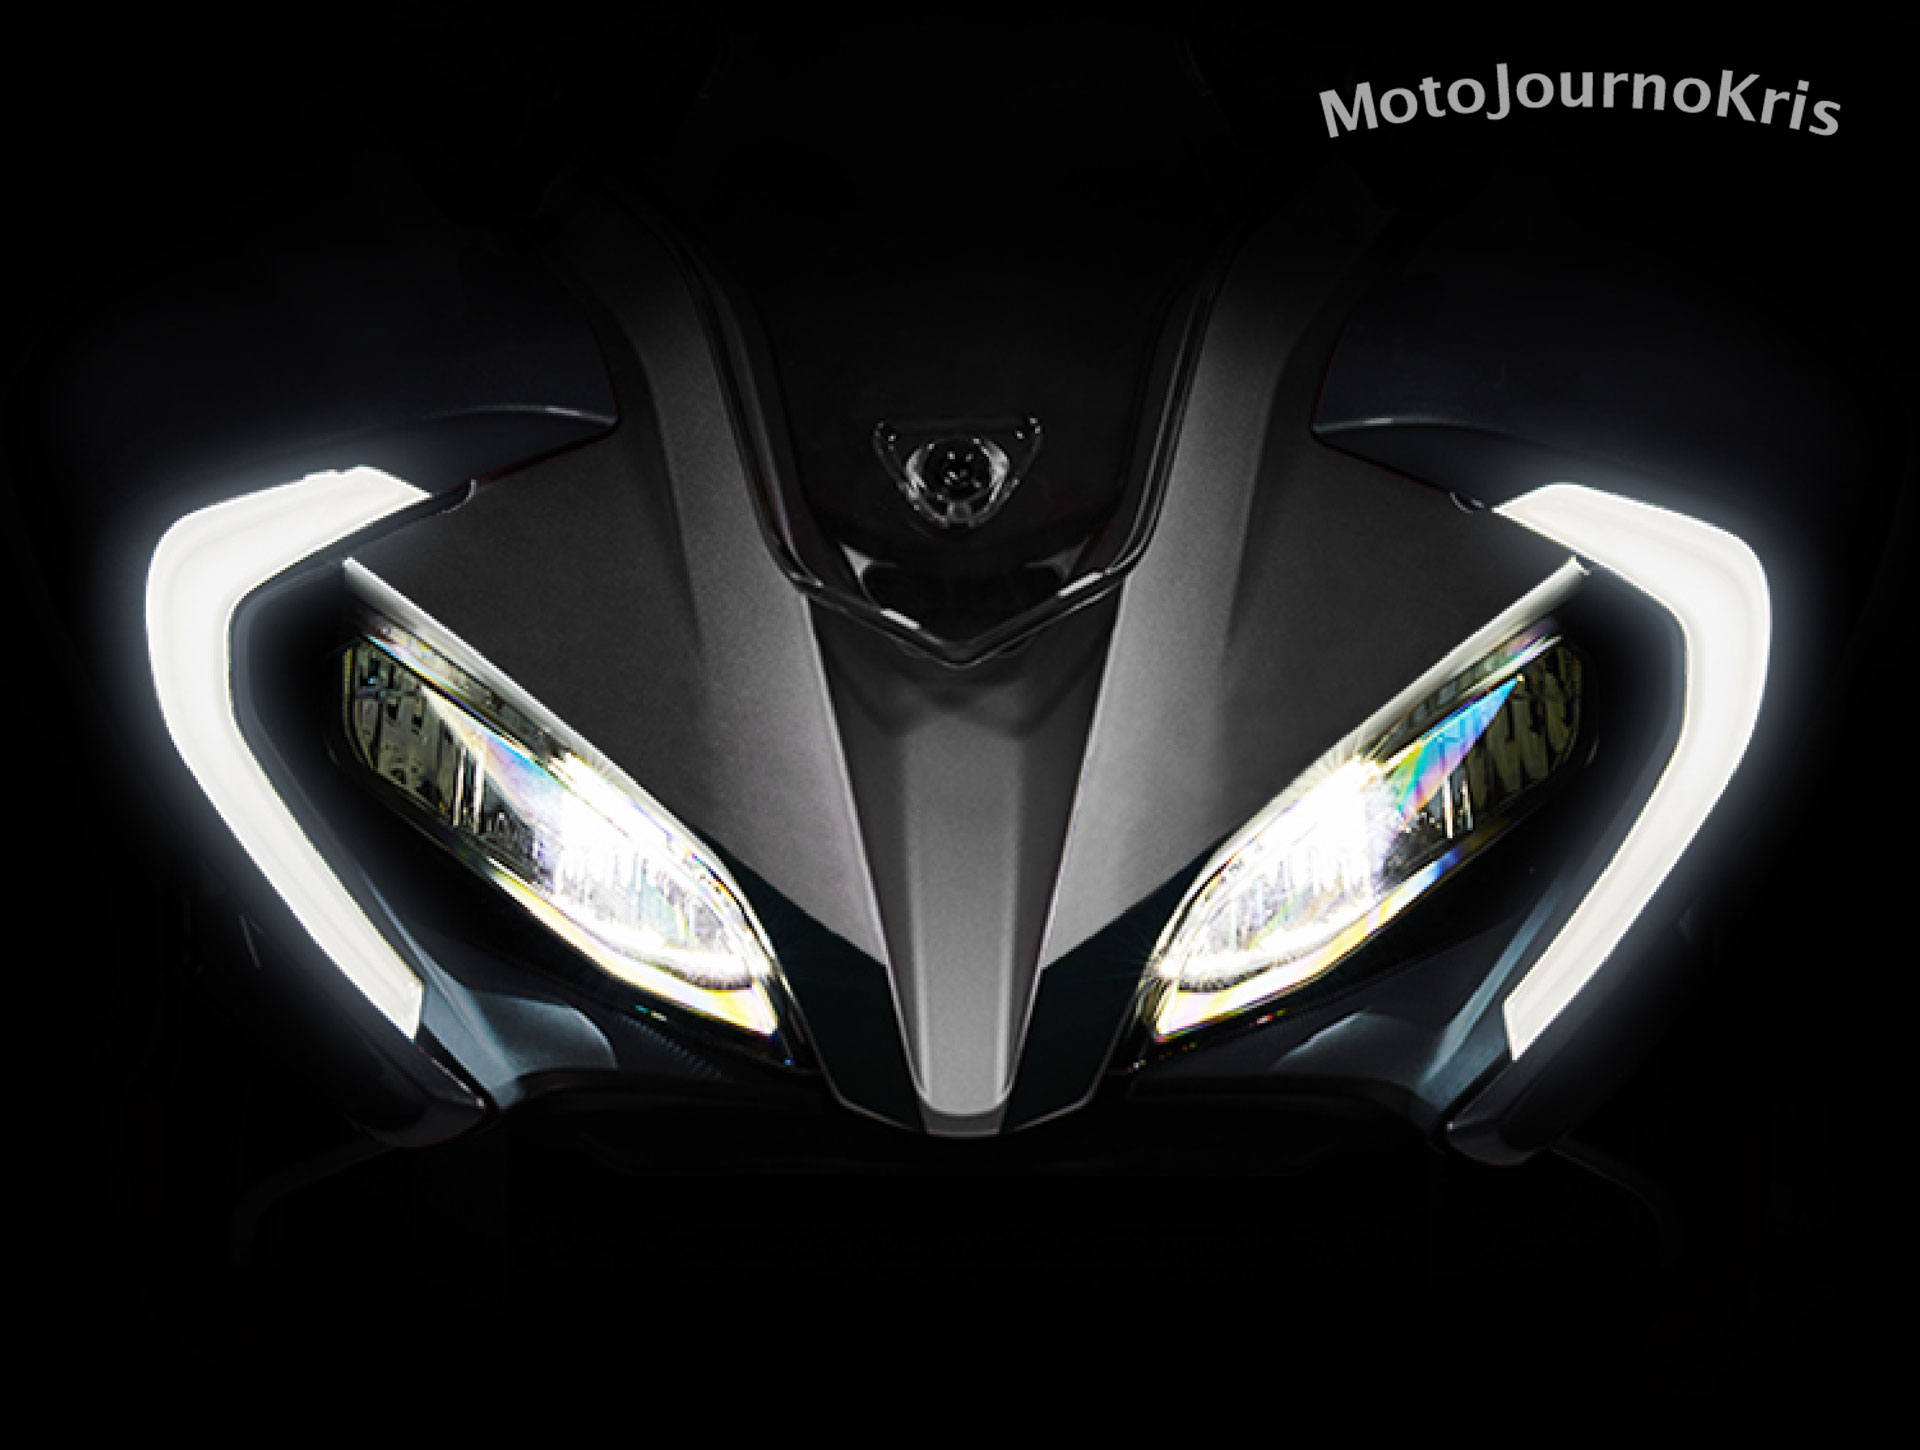 2020 CFMoto 300SR sportsbike LED headlights and lights